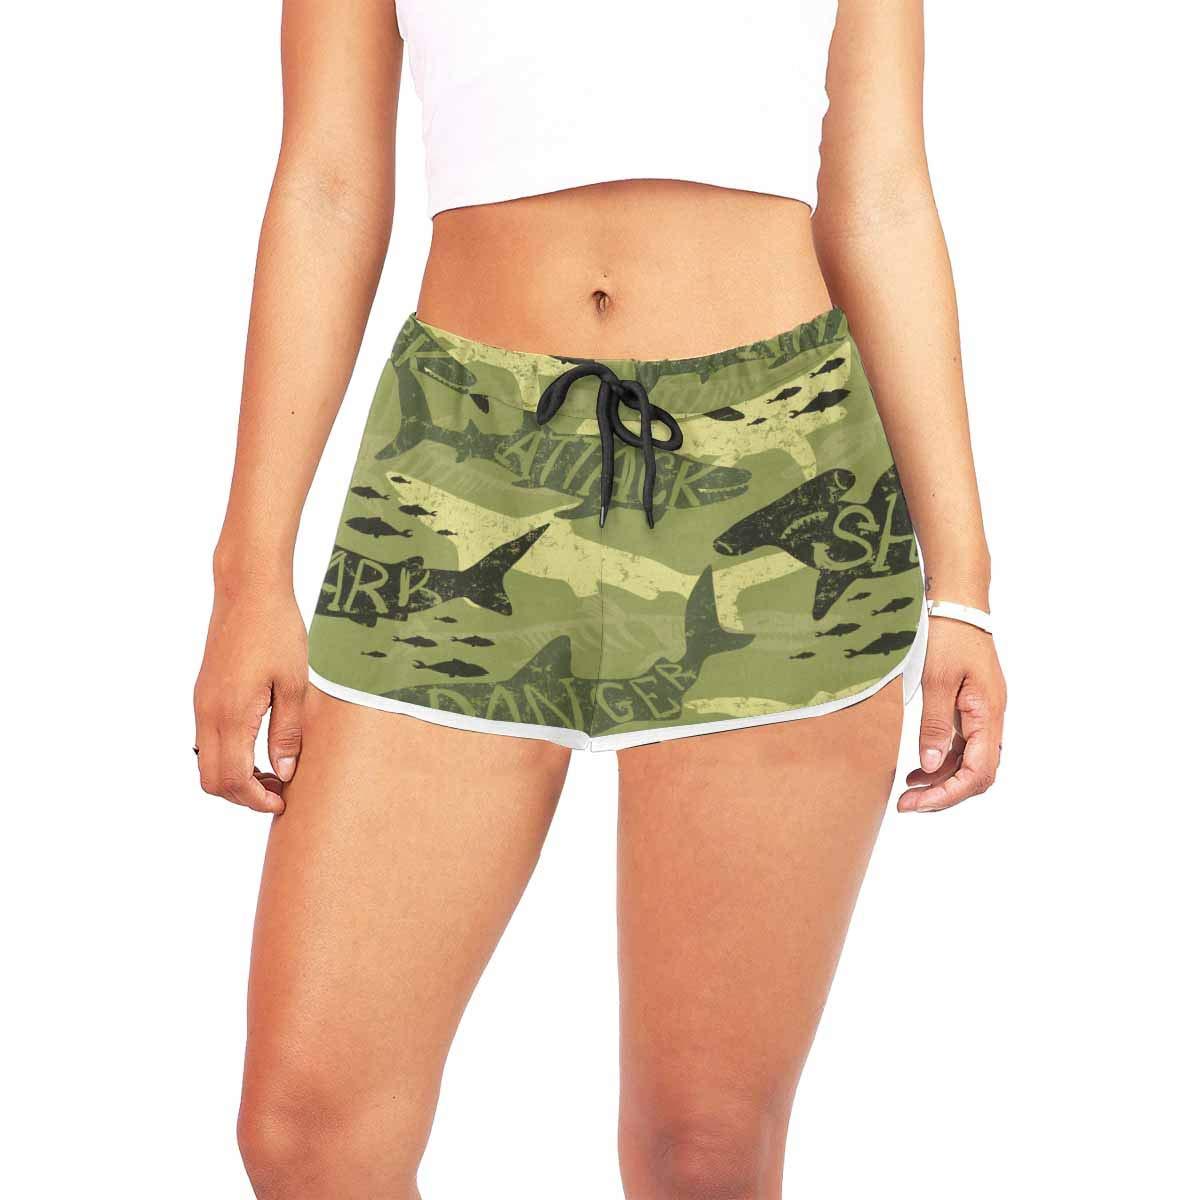 InterestPrint Novelty Design Womens Shorts Running Workout Athletic Beach Shorts